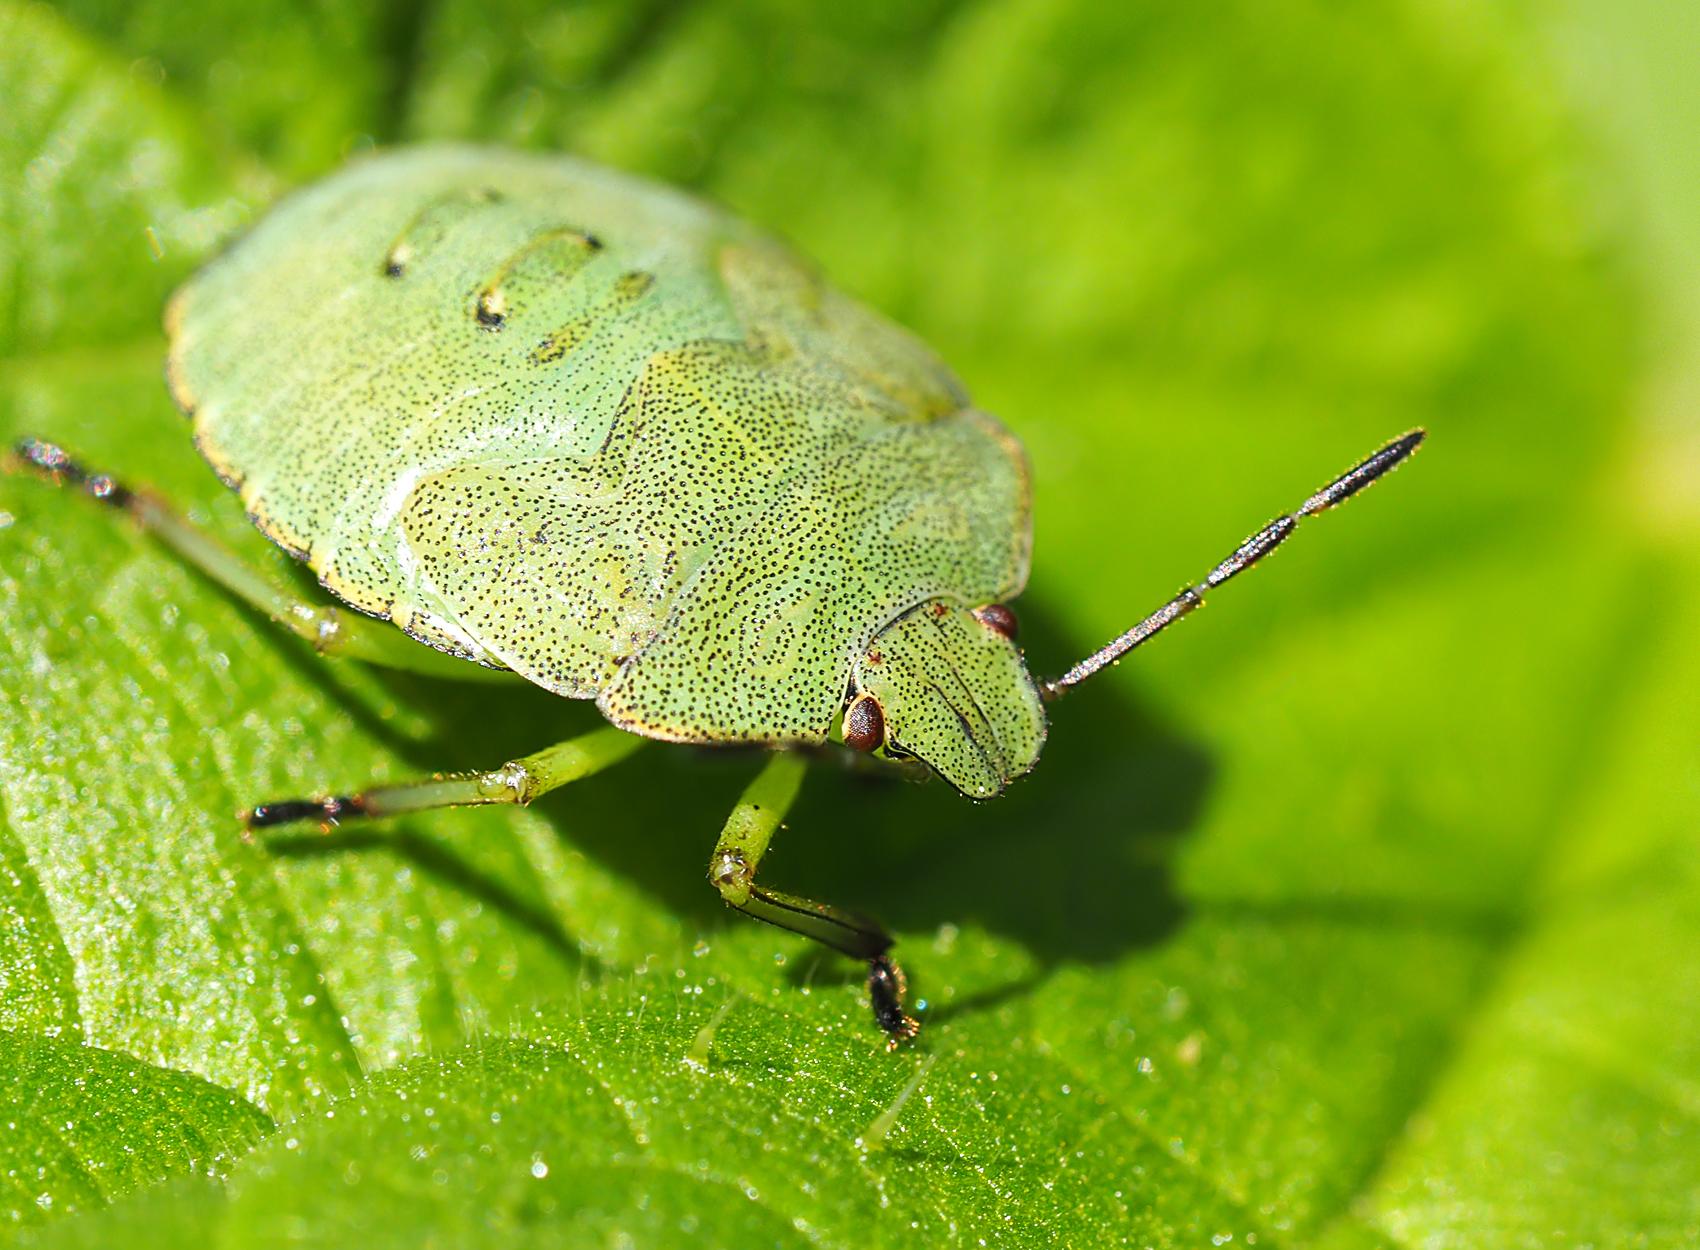 Grüne Stinkwanze (Polomena prasina)